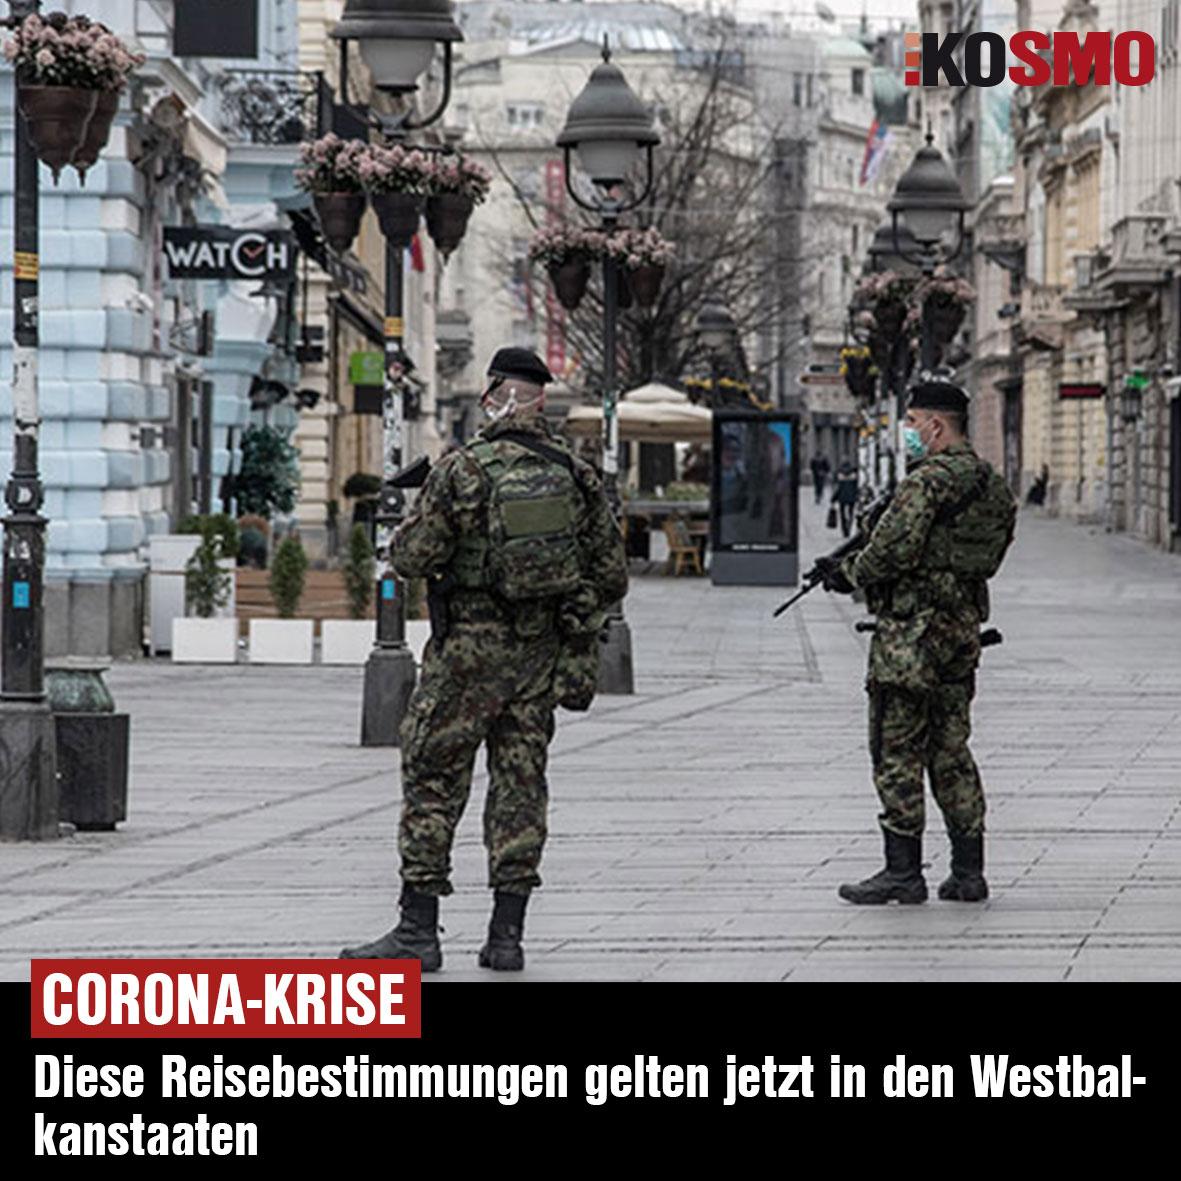 www.kosmo.at